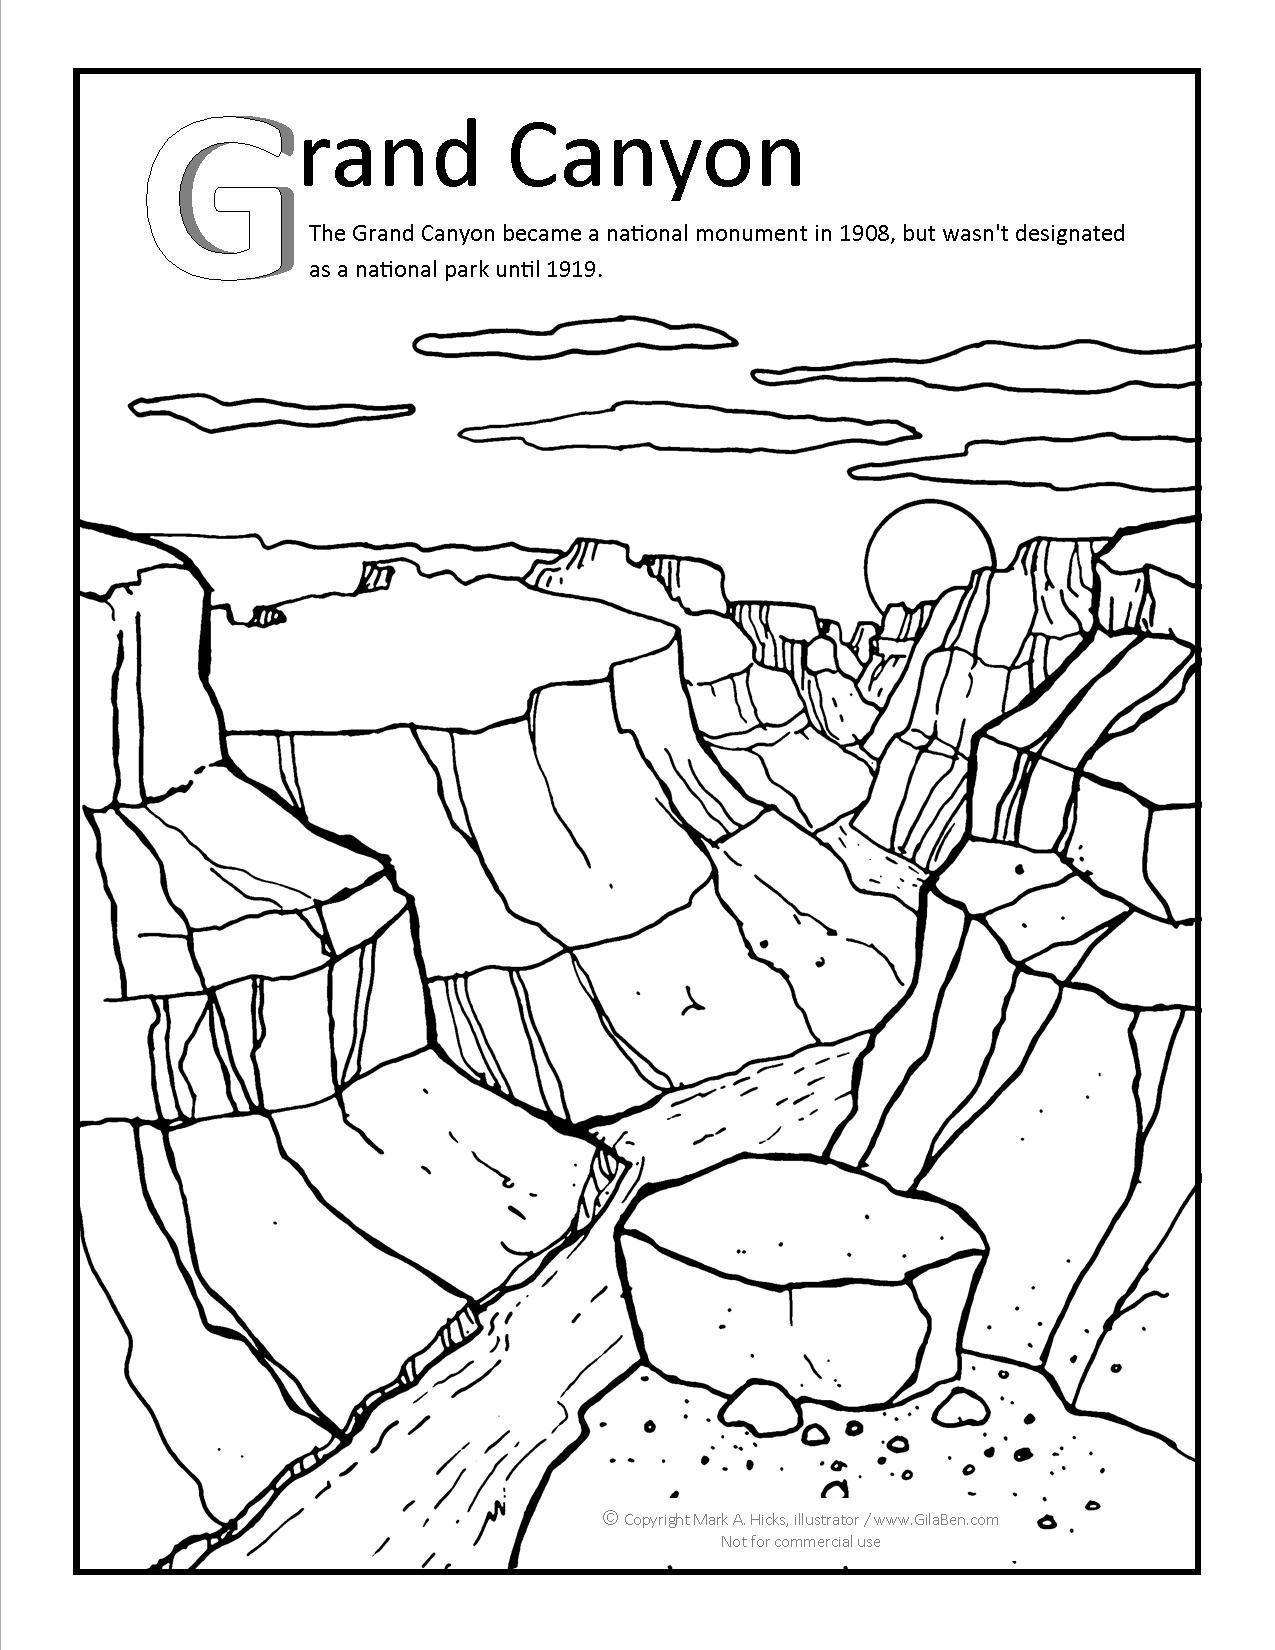 Grand Canyon clipart Grand page Coloring Grand Canyon